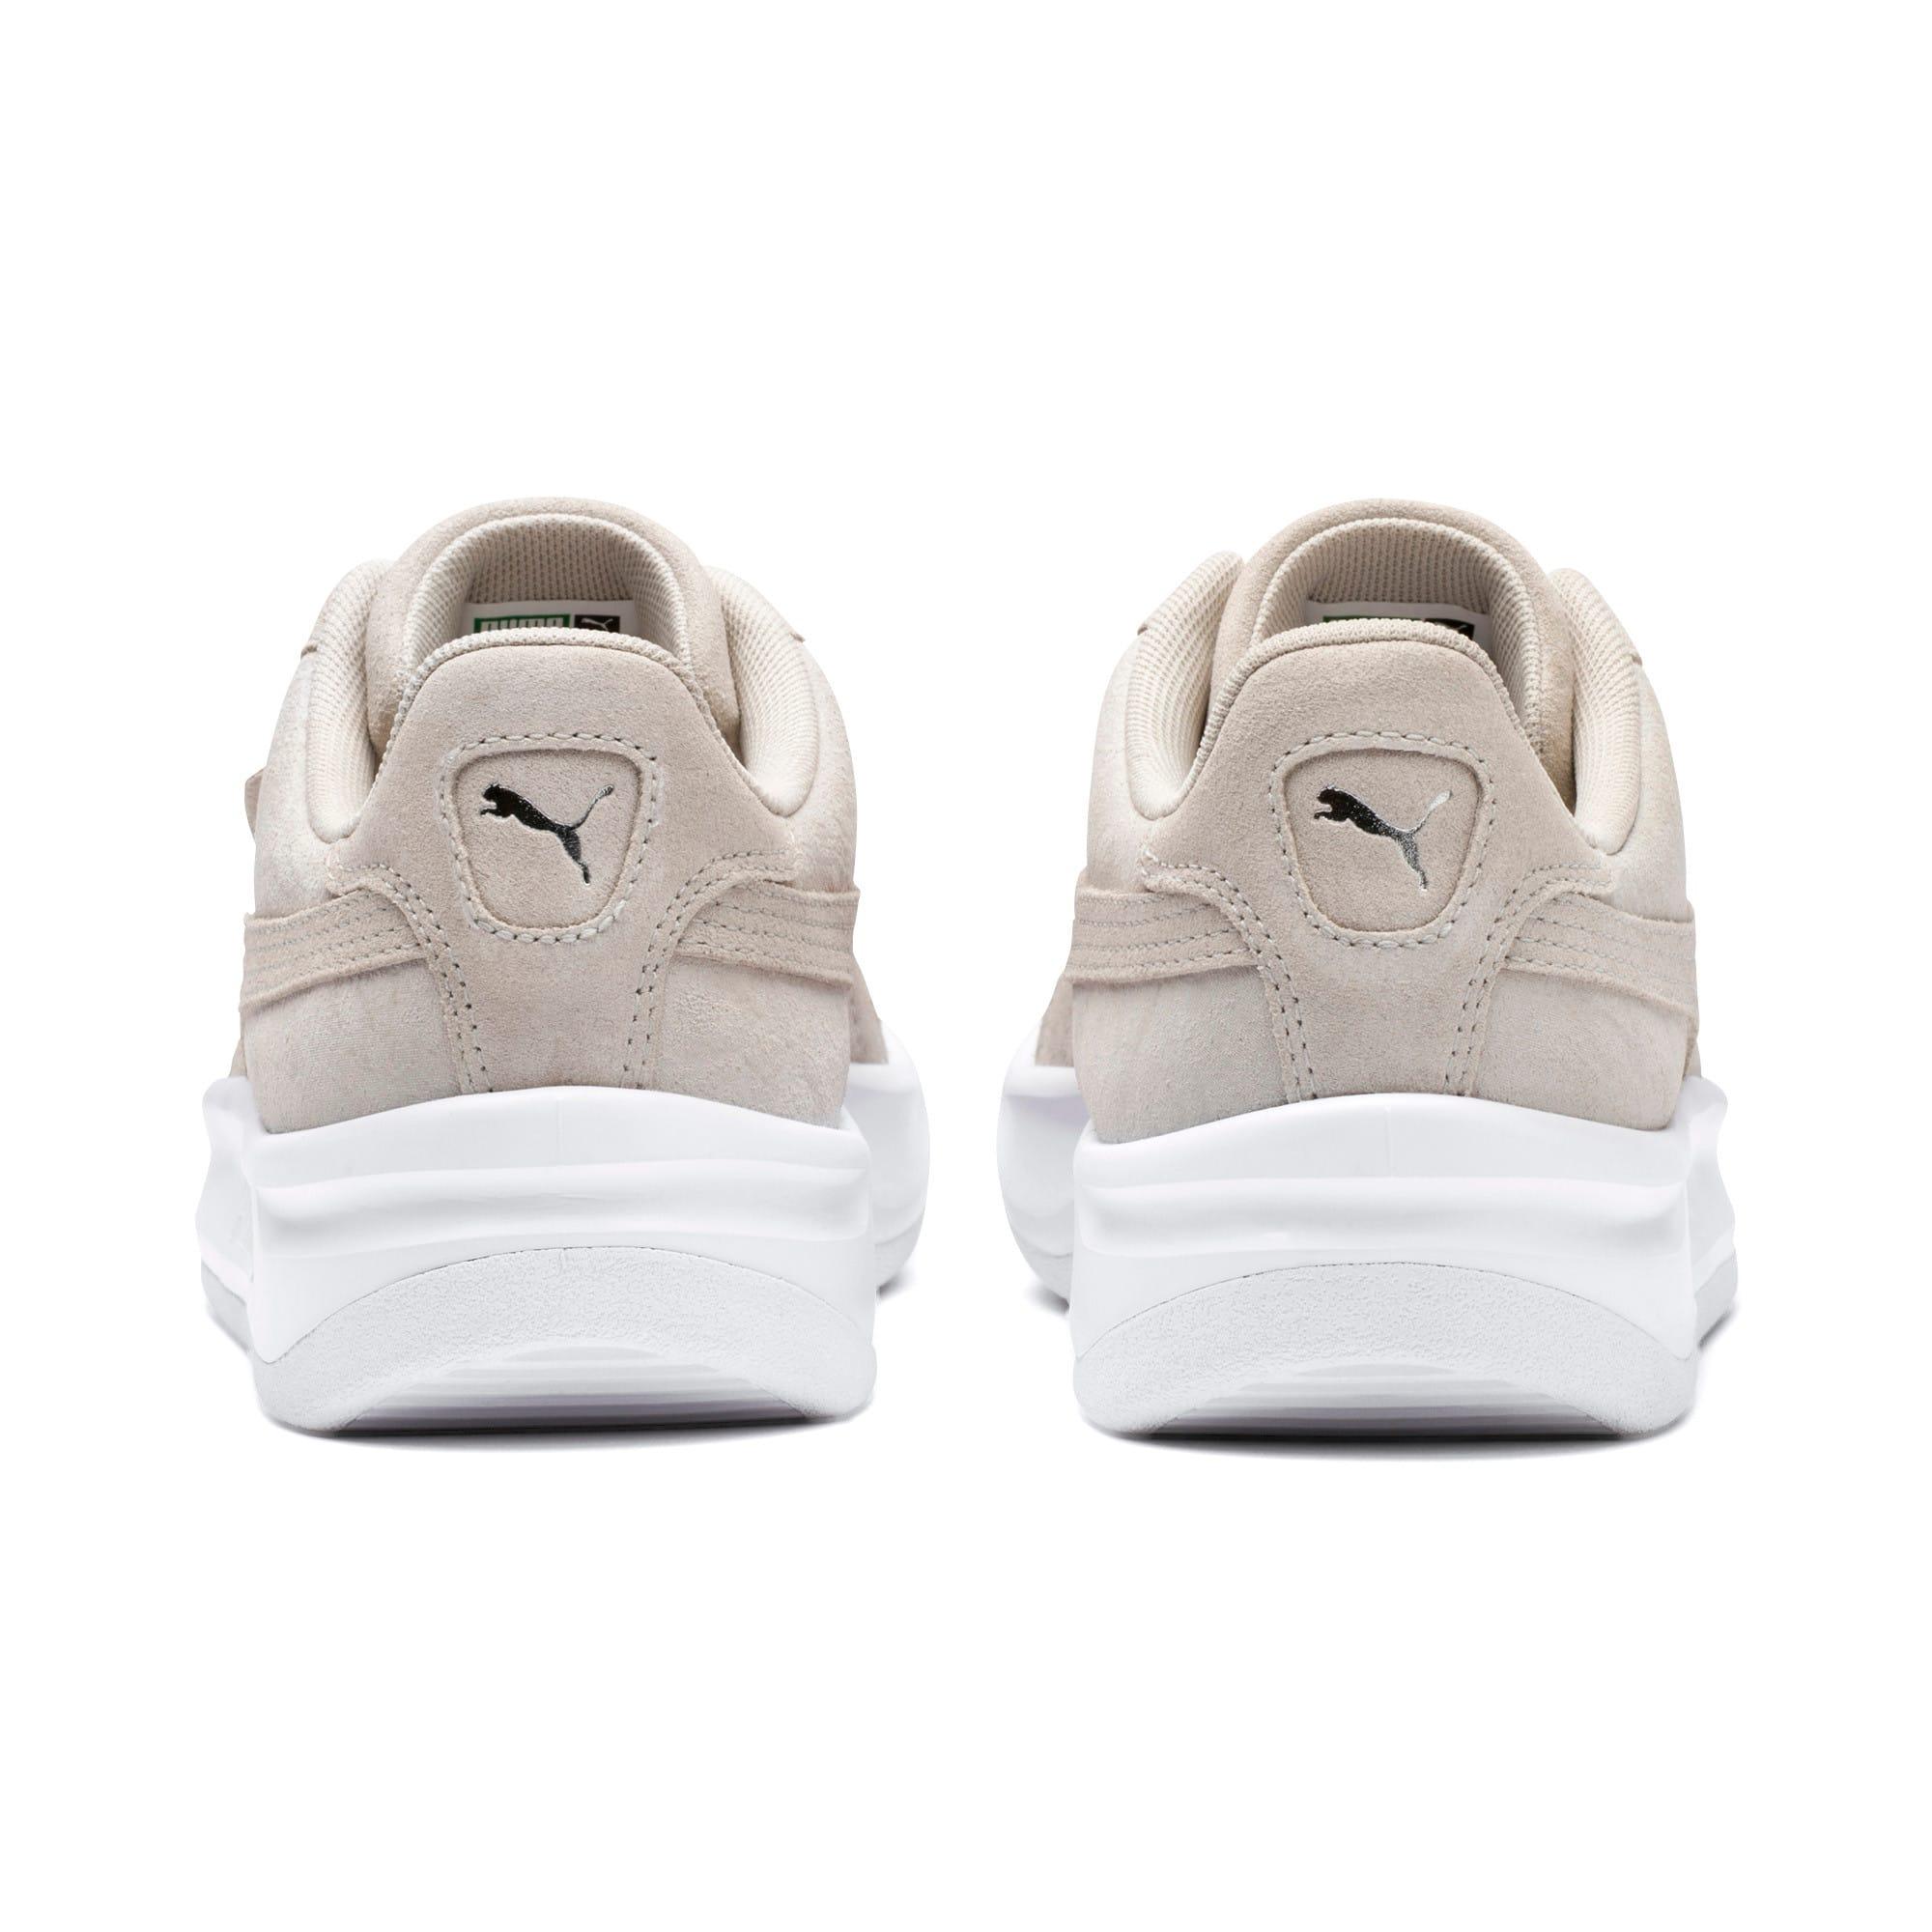 Thumbnail 4 of California Shimmer Damen Sneaker, Silver Gray-Puma Silver, medium